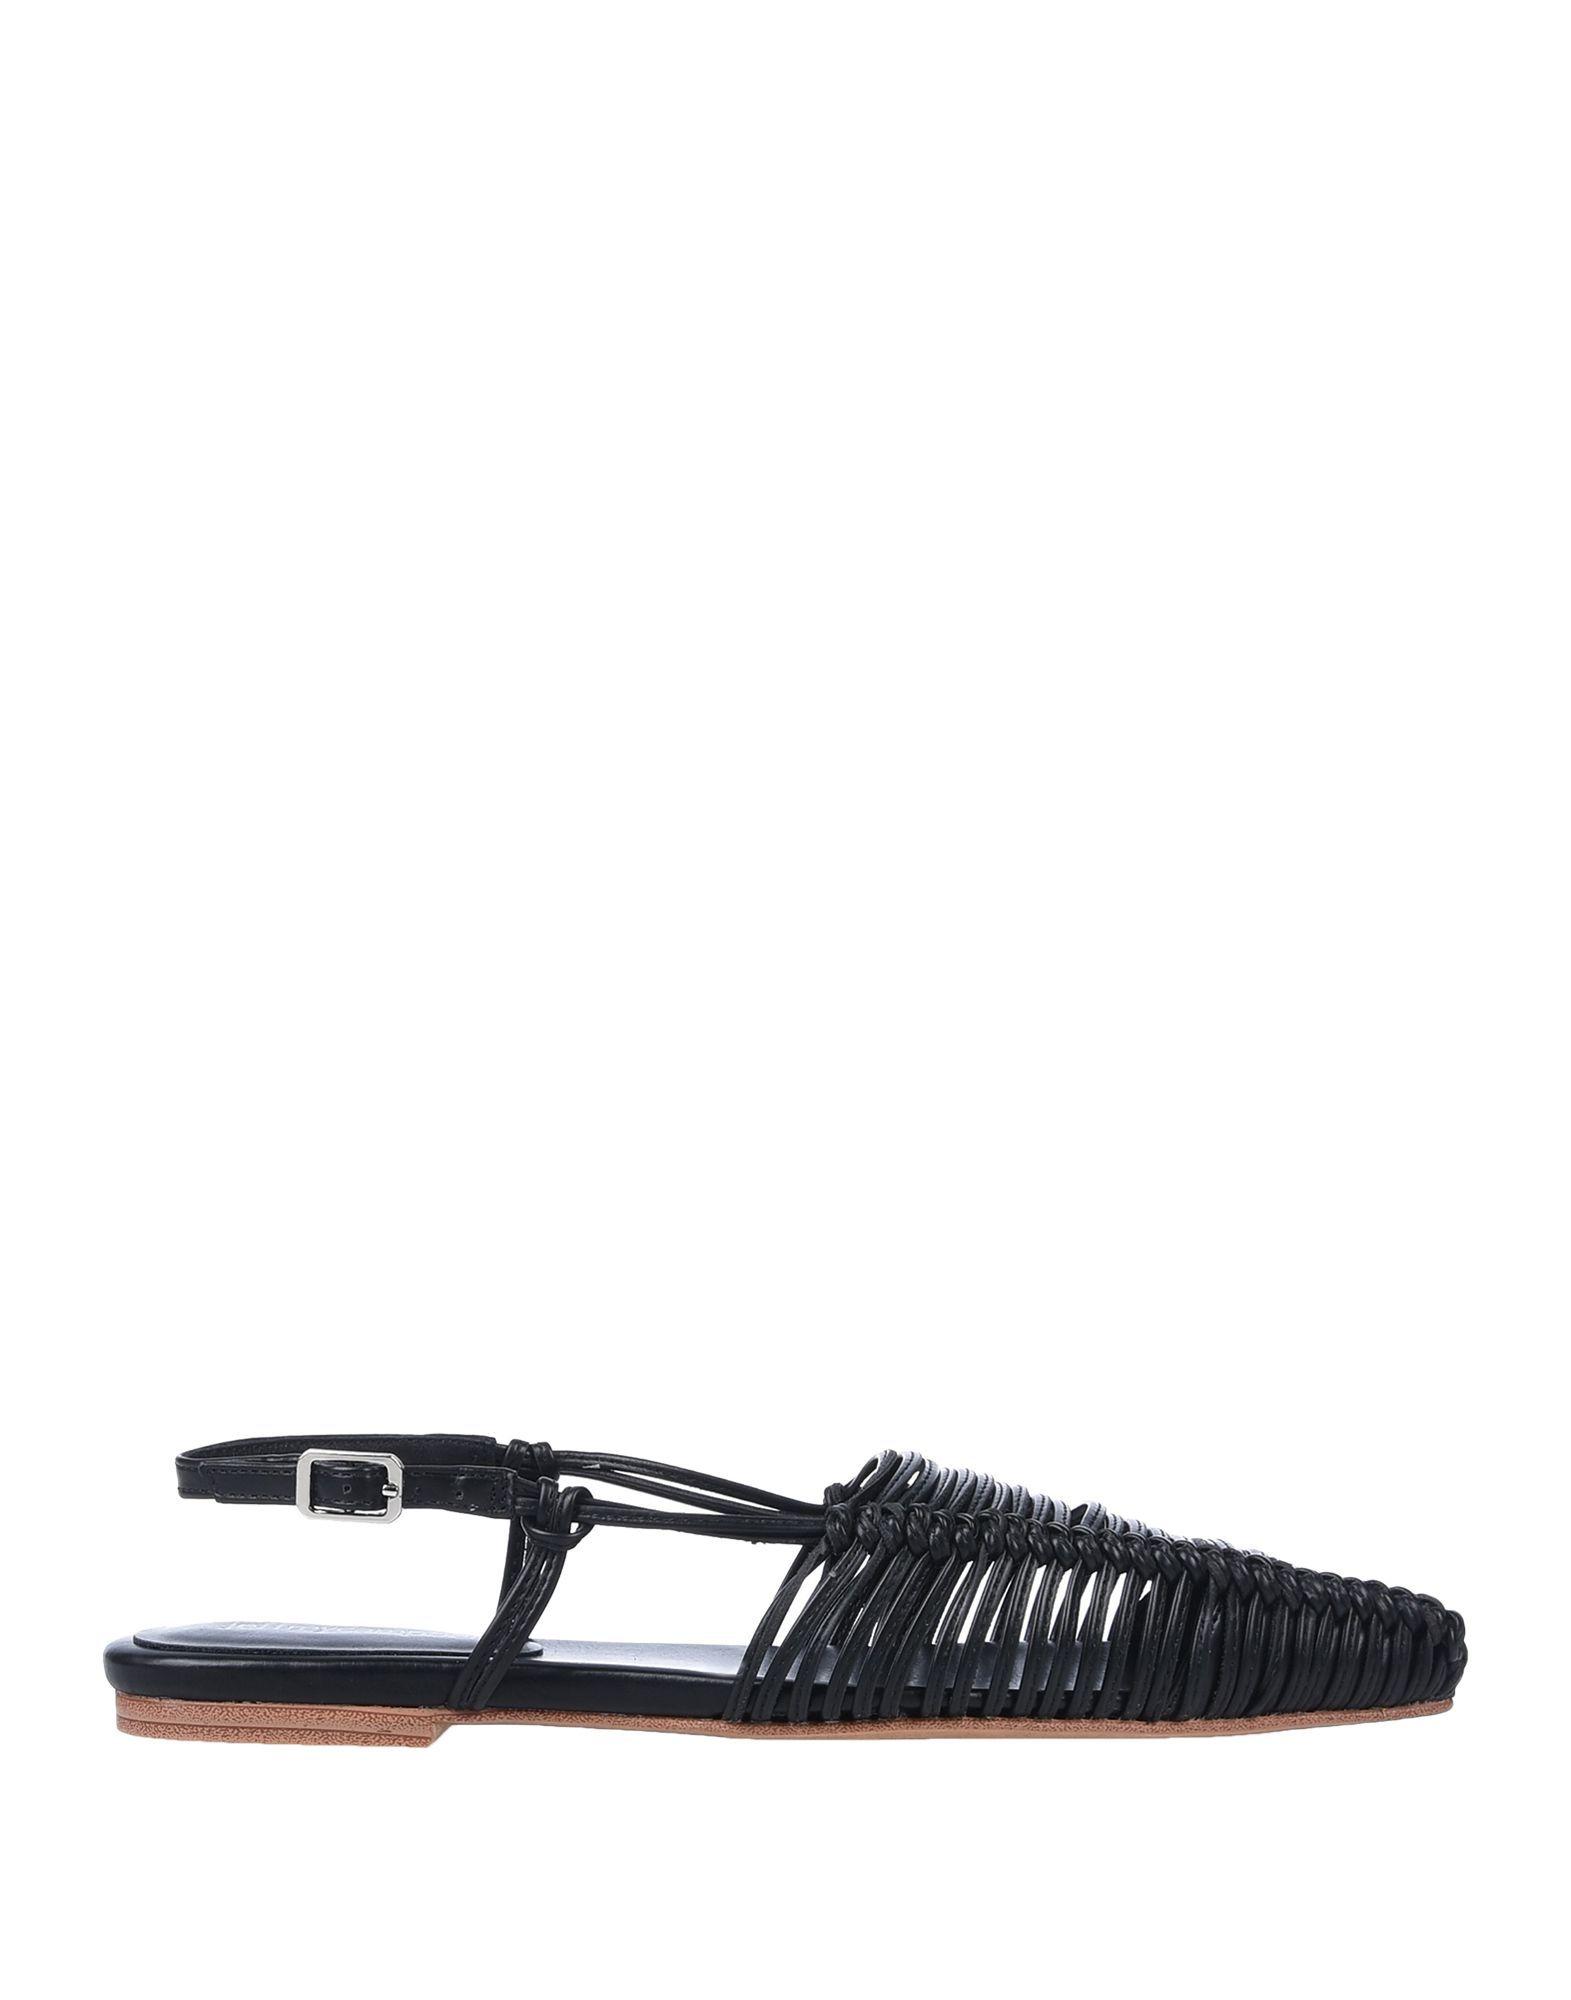 Jeffrey Campbell Women's Sandals Black Polyurethane